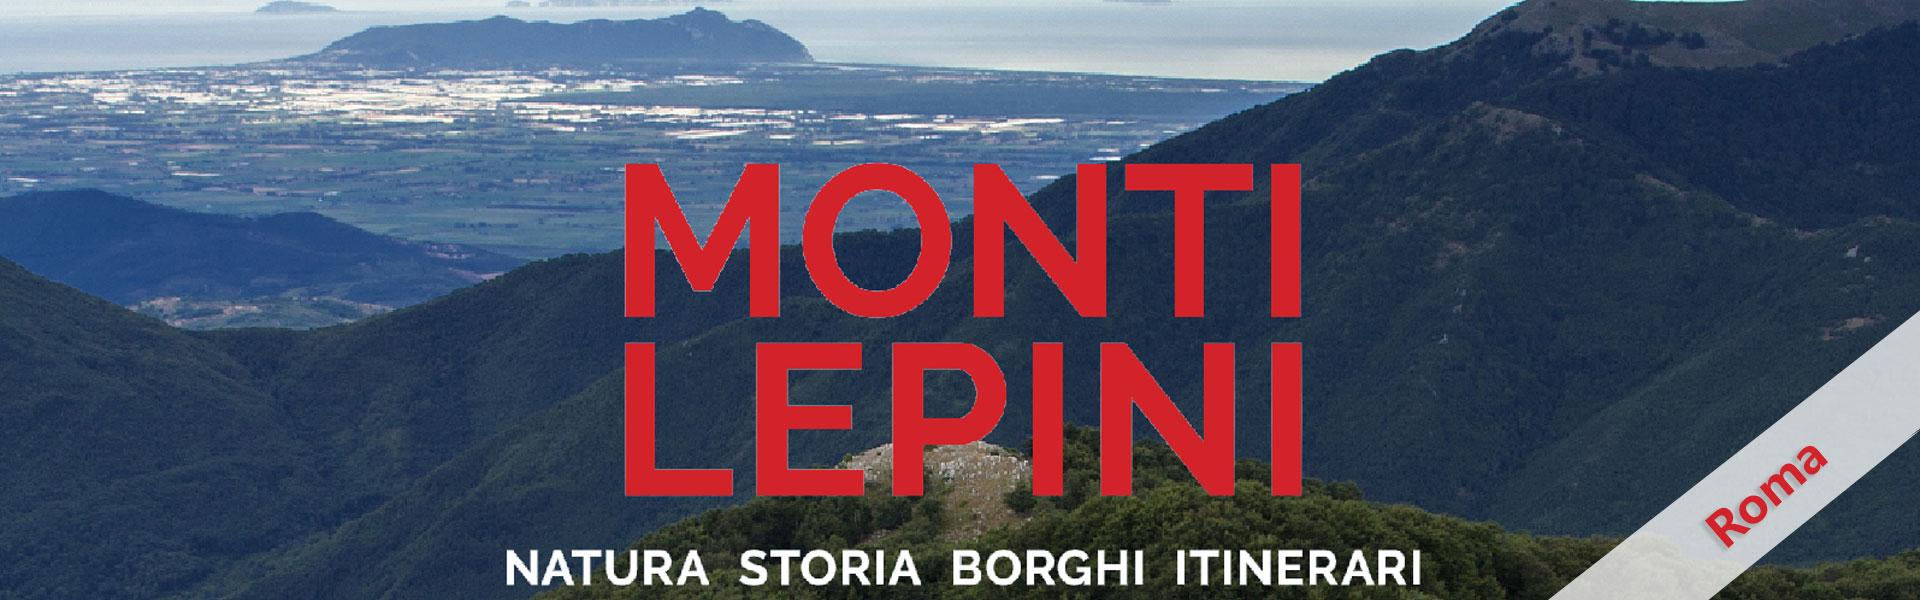 roma-copertina-pagina-presentazione-guida-turistica-1920x600